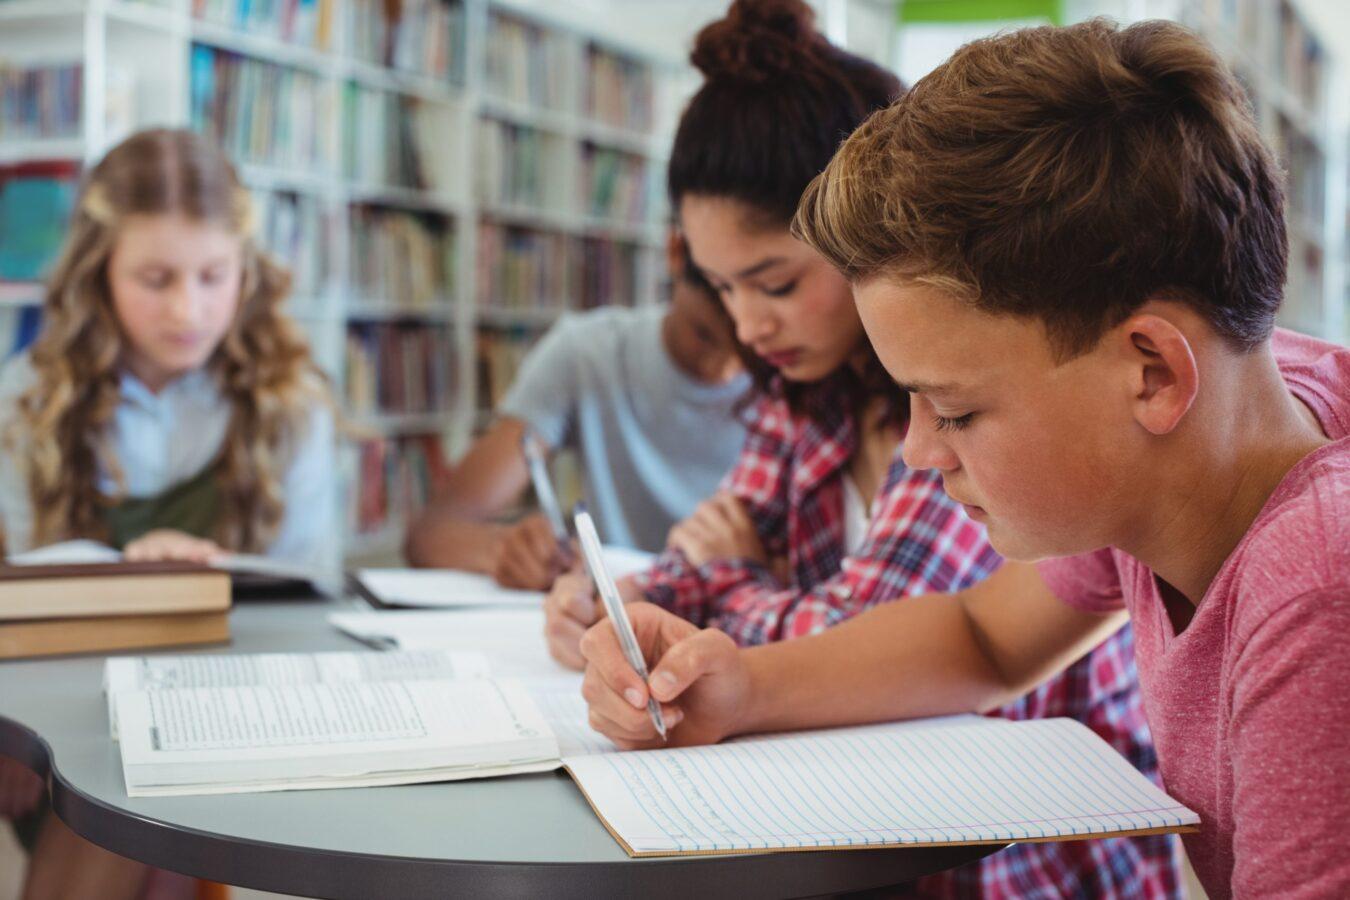 Pupils studying